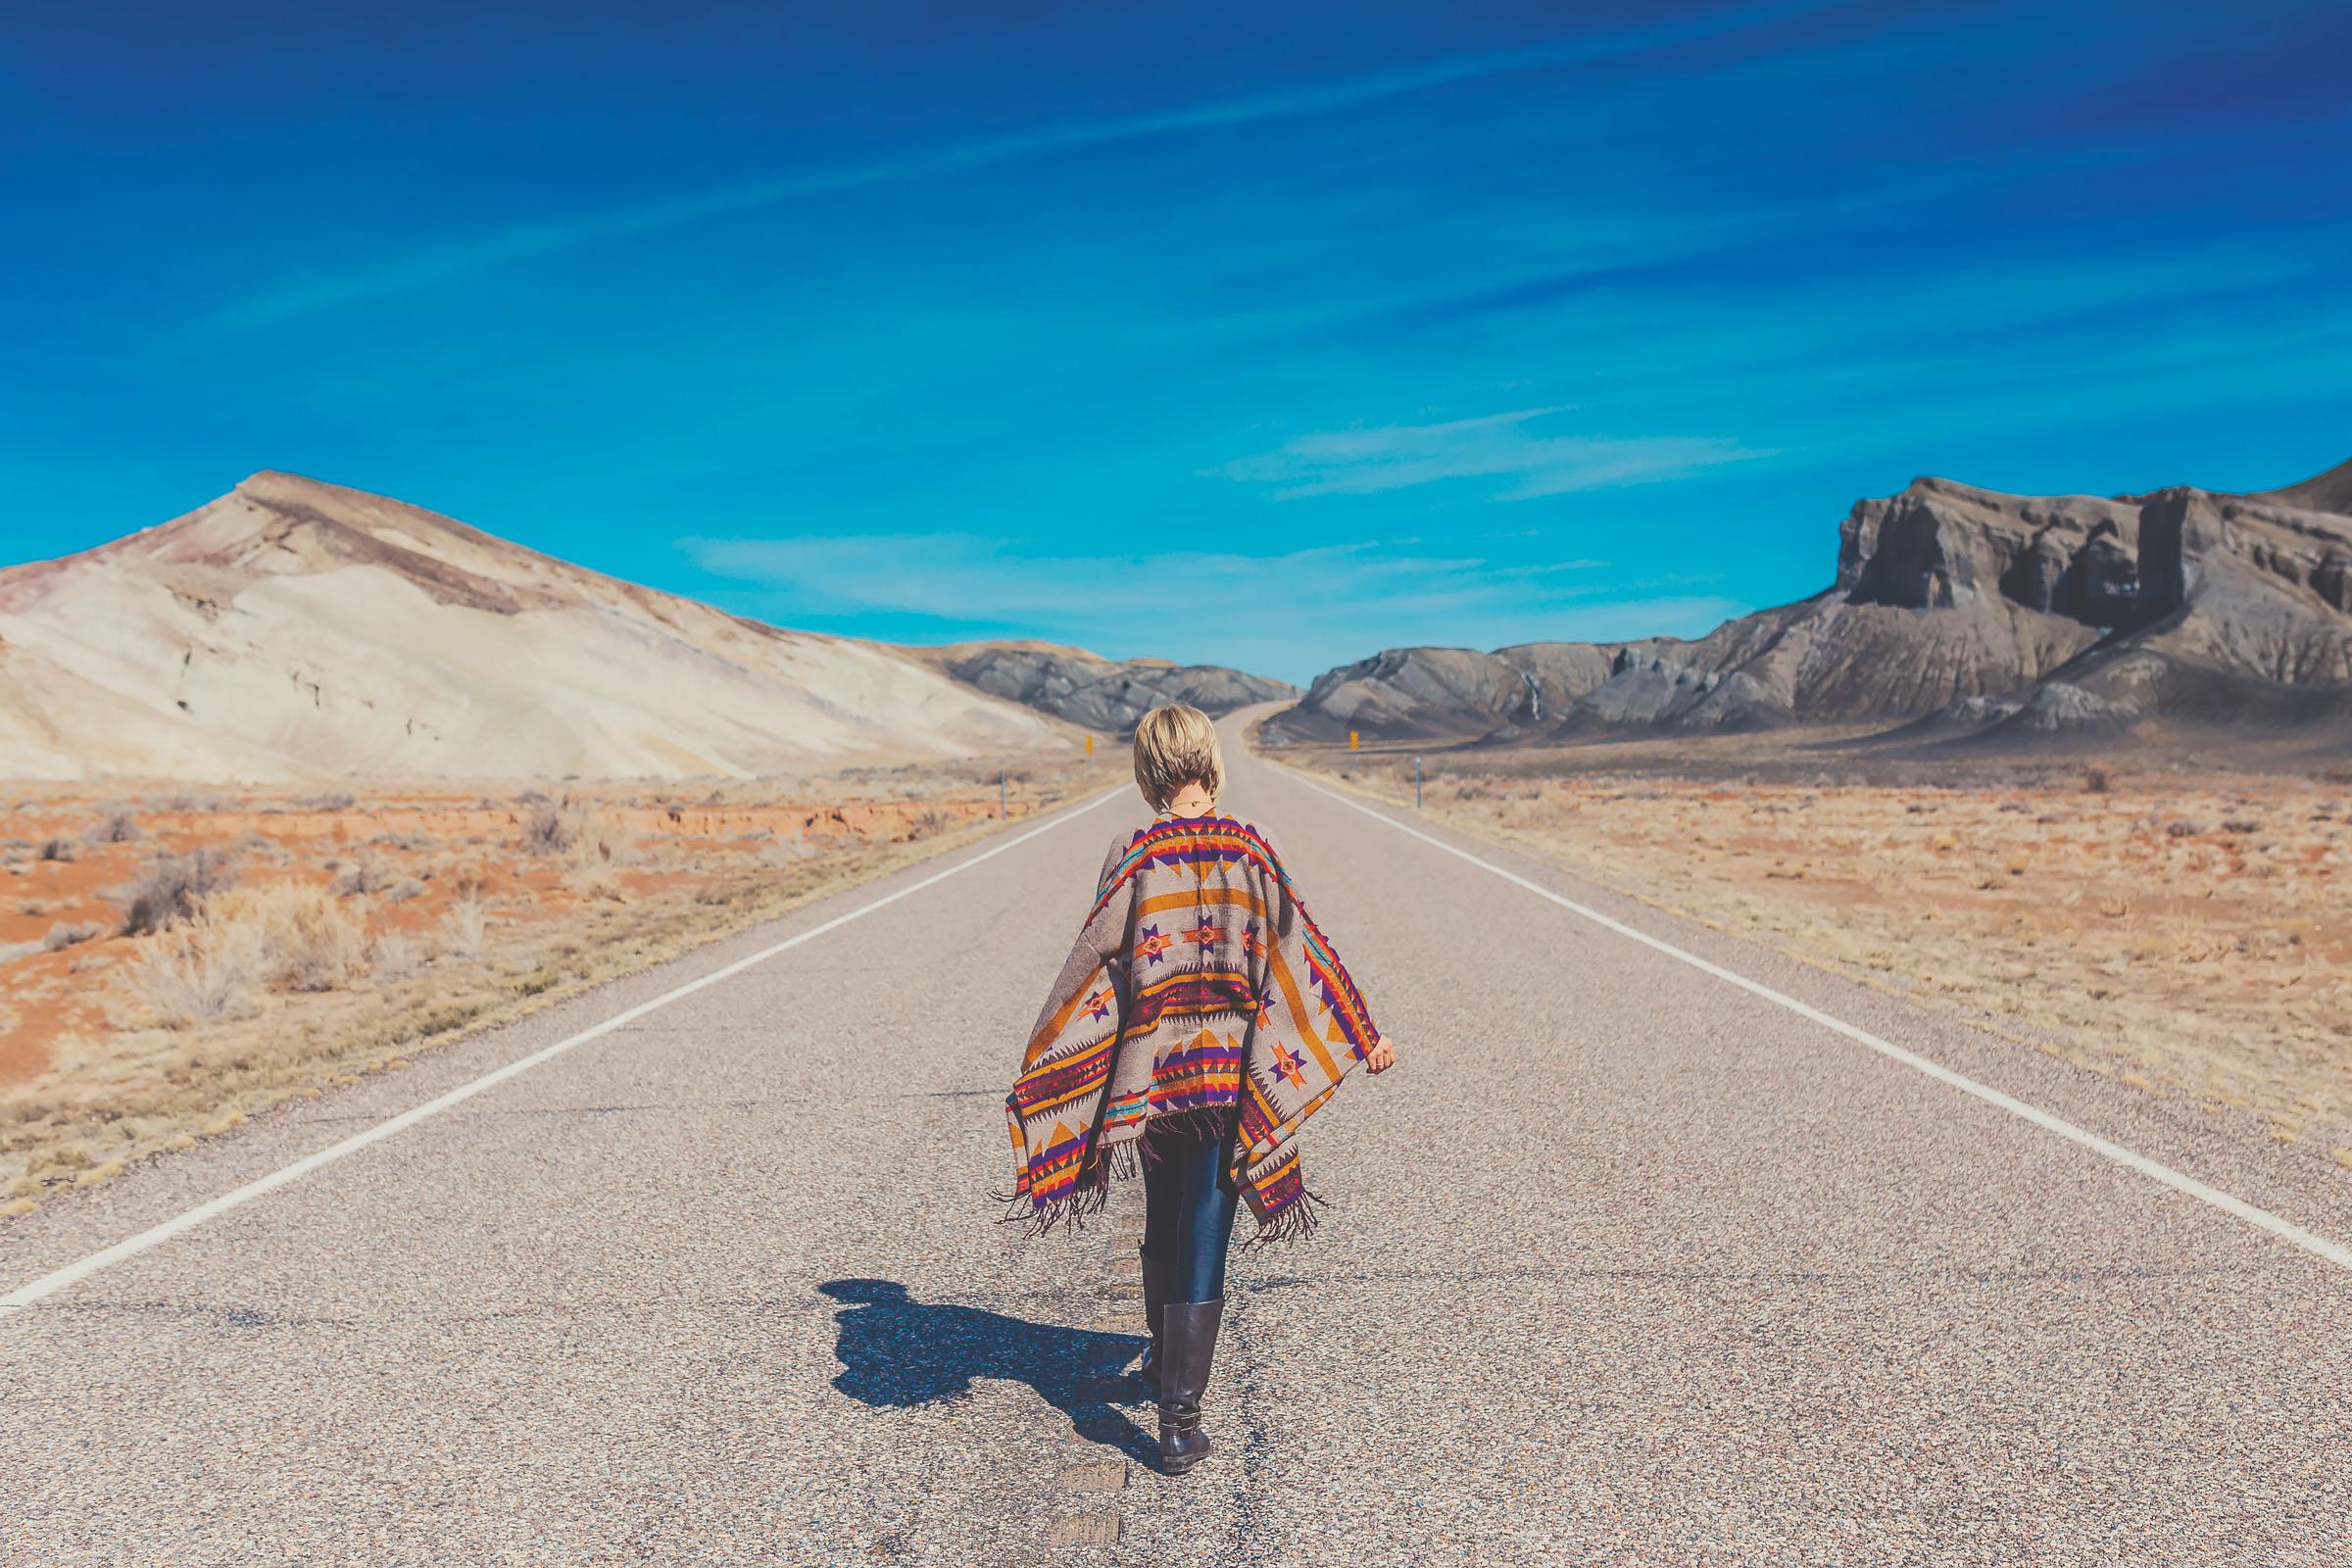 utah desert, roadtrip, travel photography, jennifer picard photography